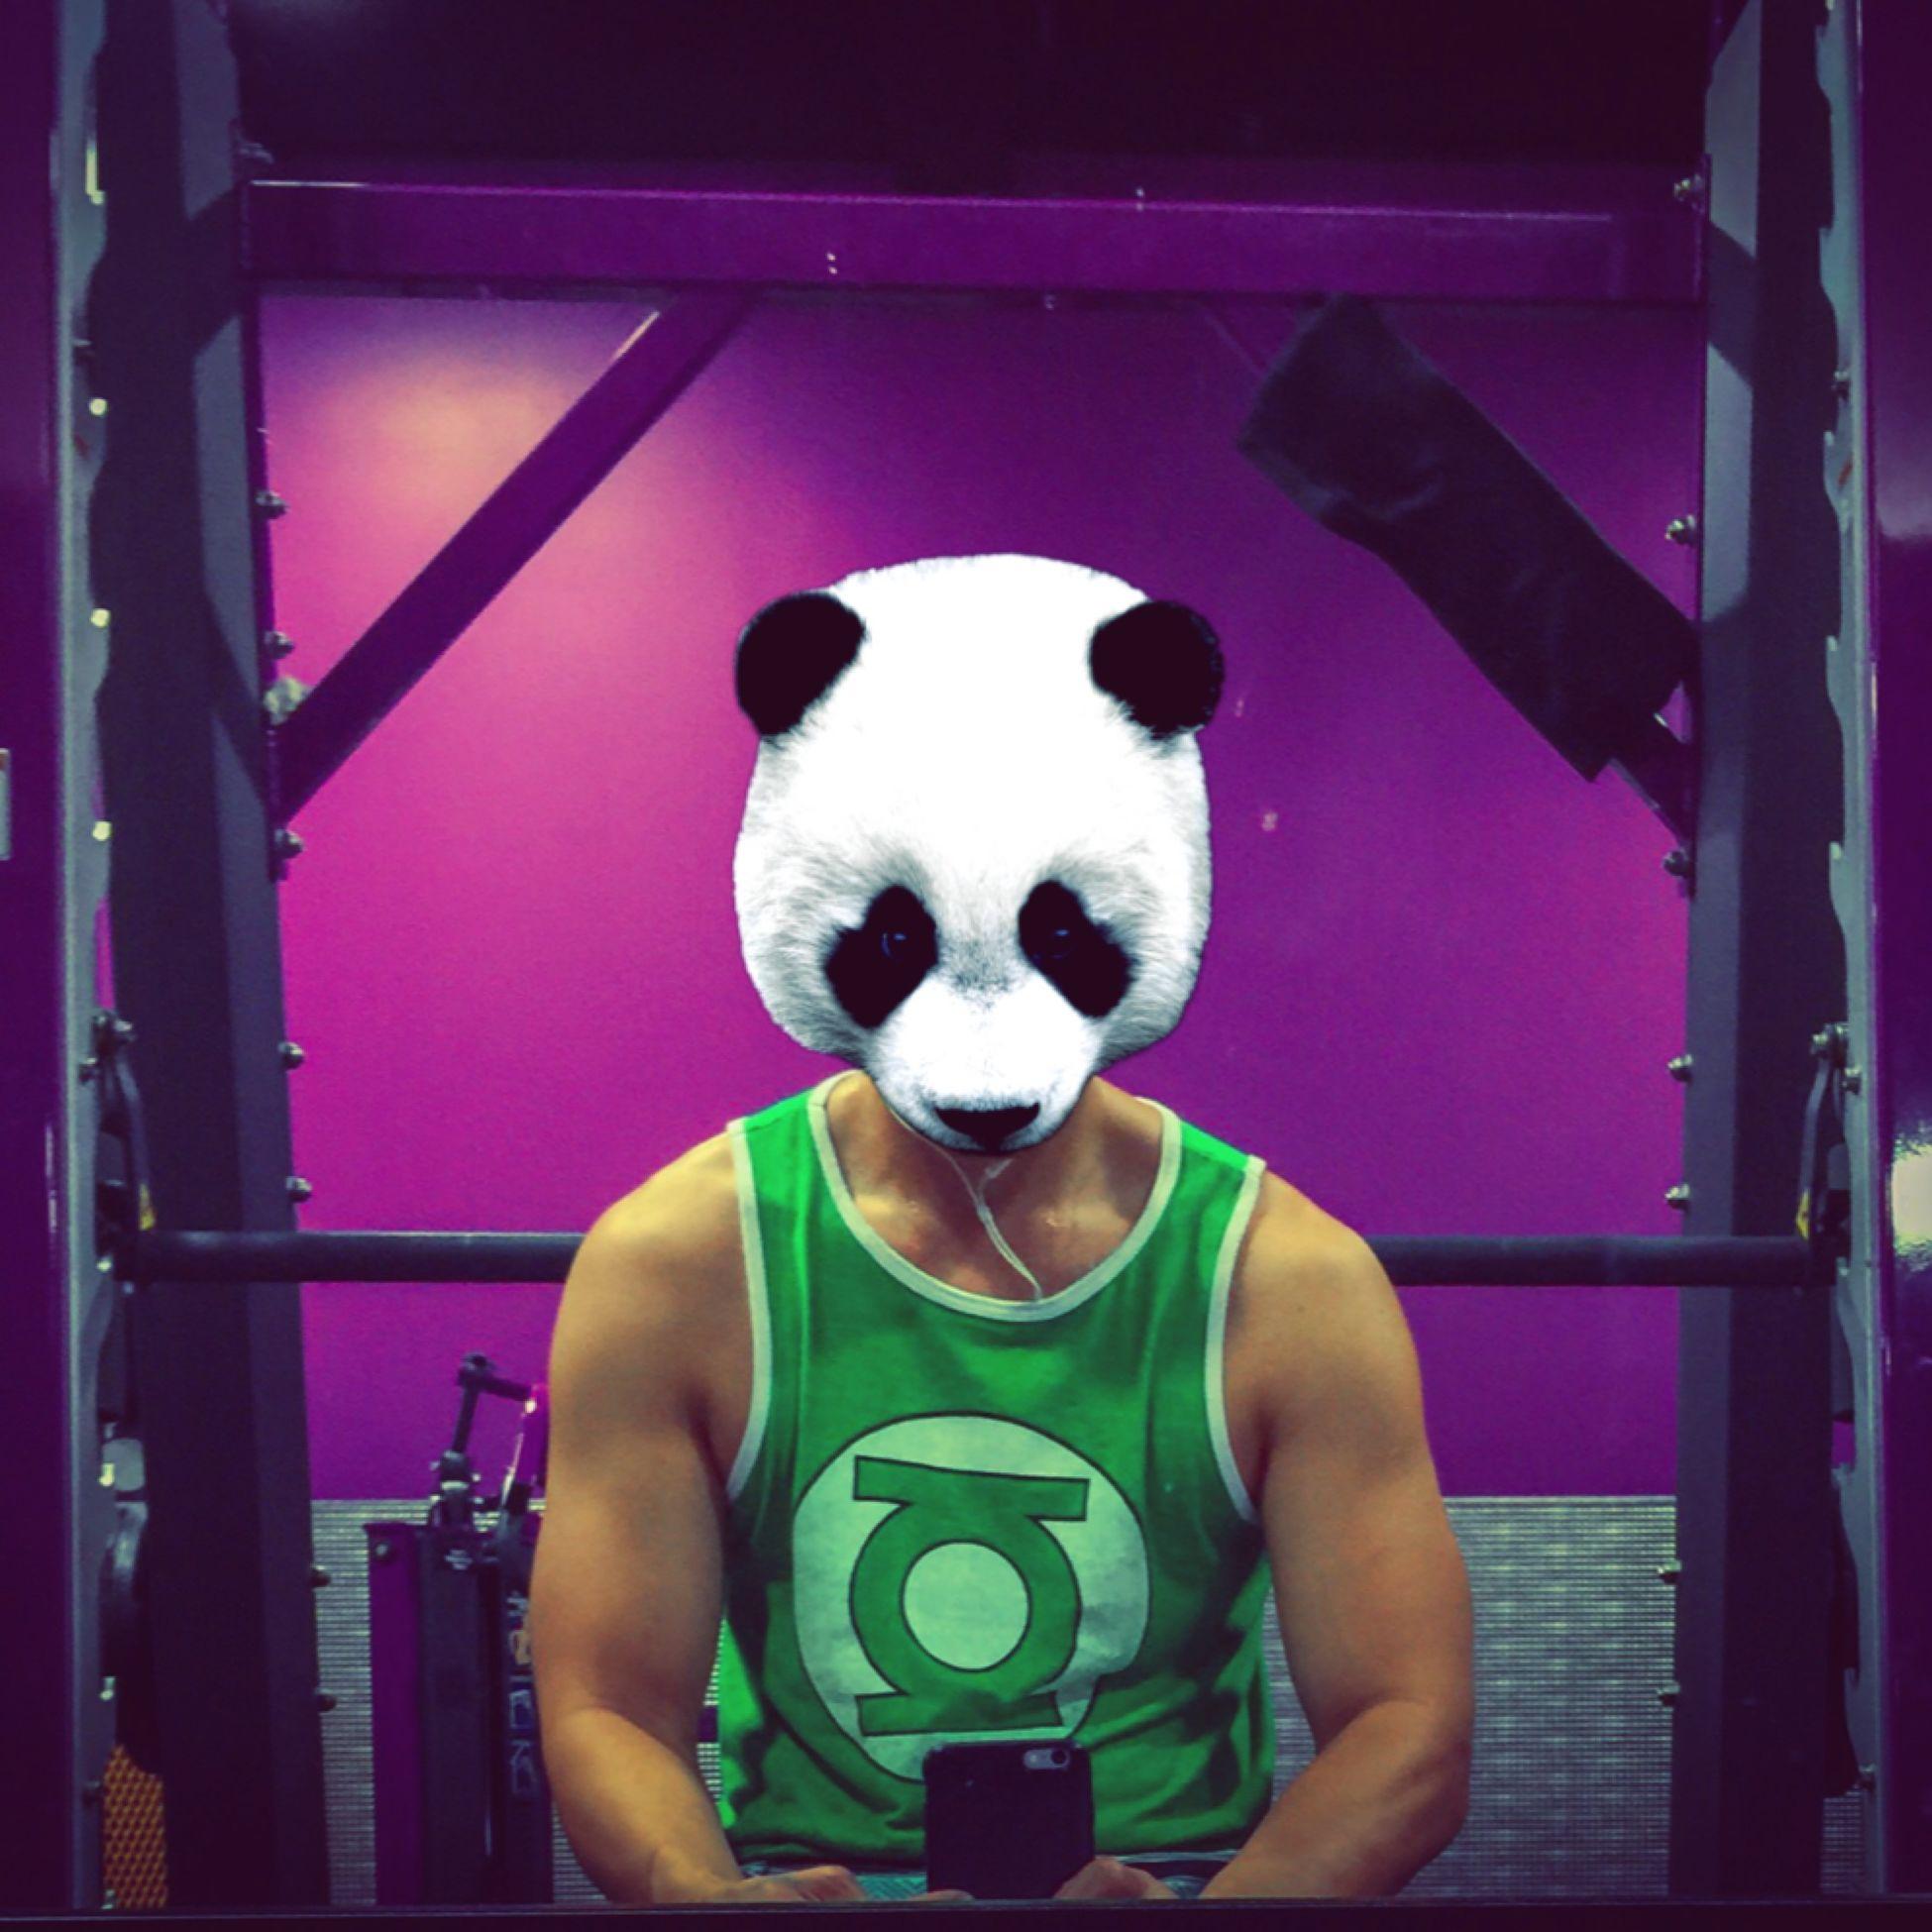 Fitness Selfie Green Lantern  Panda Chestday